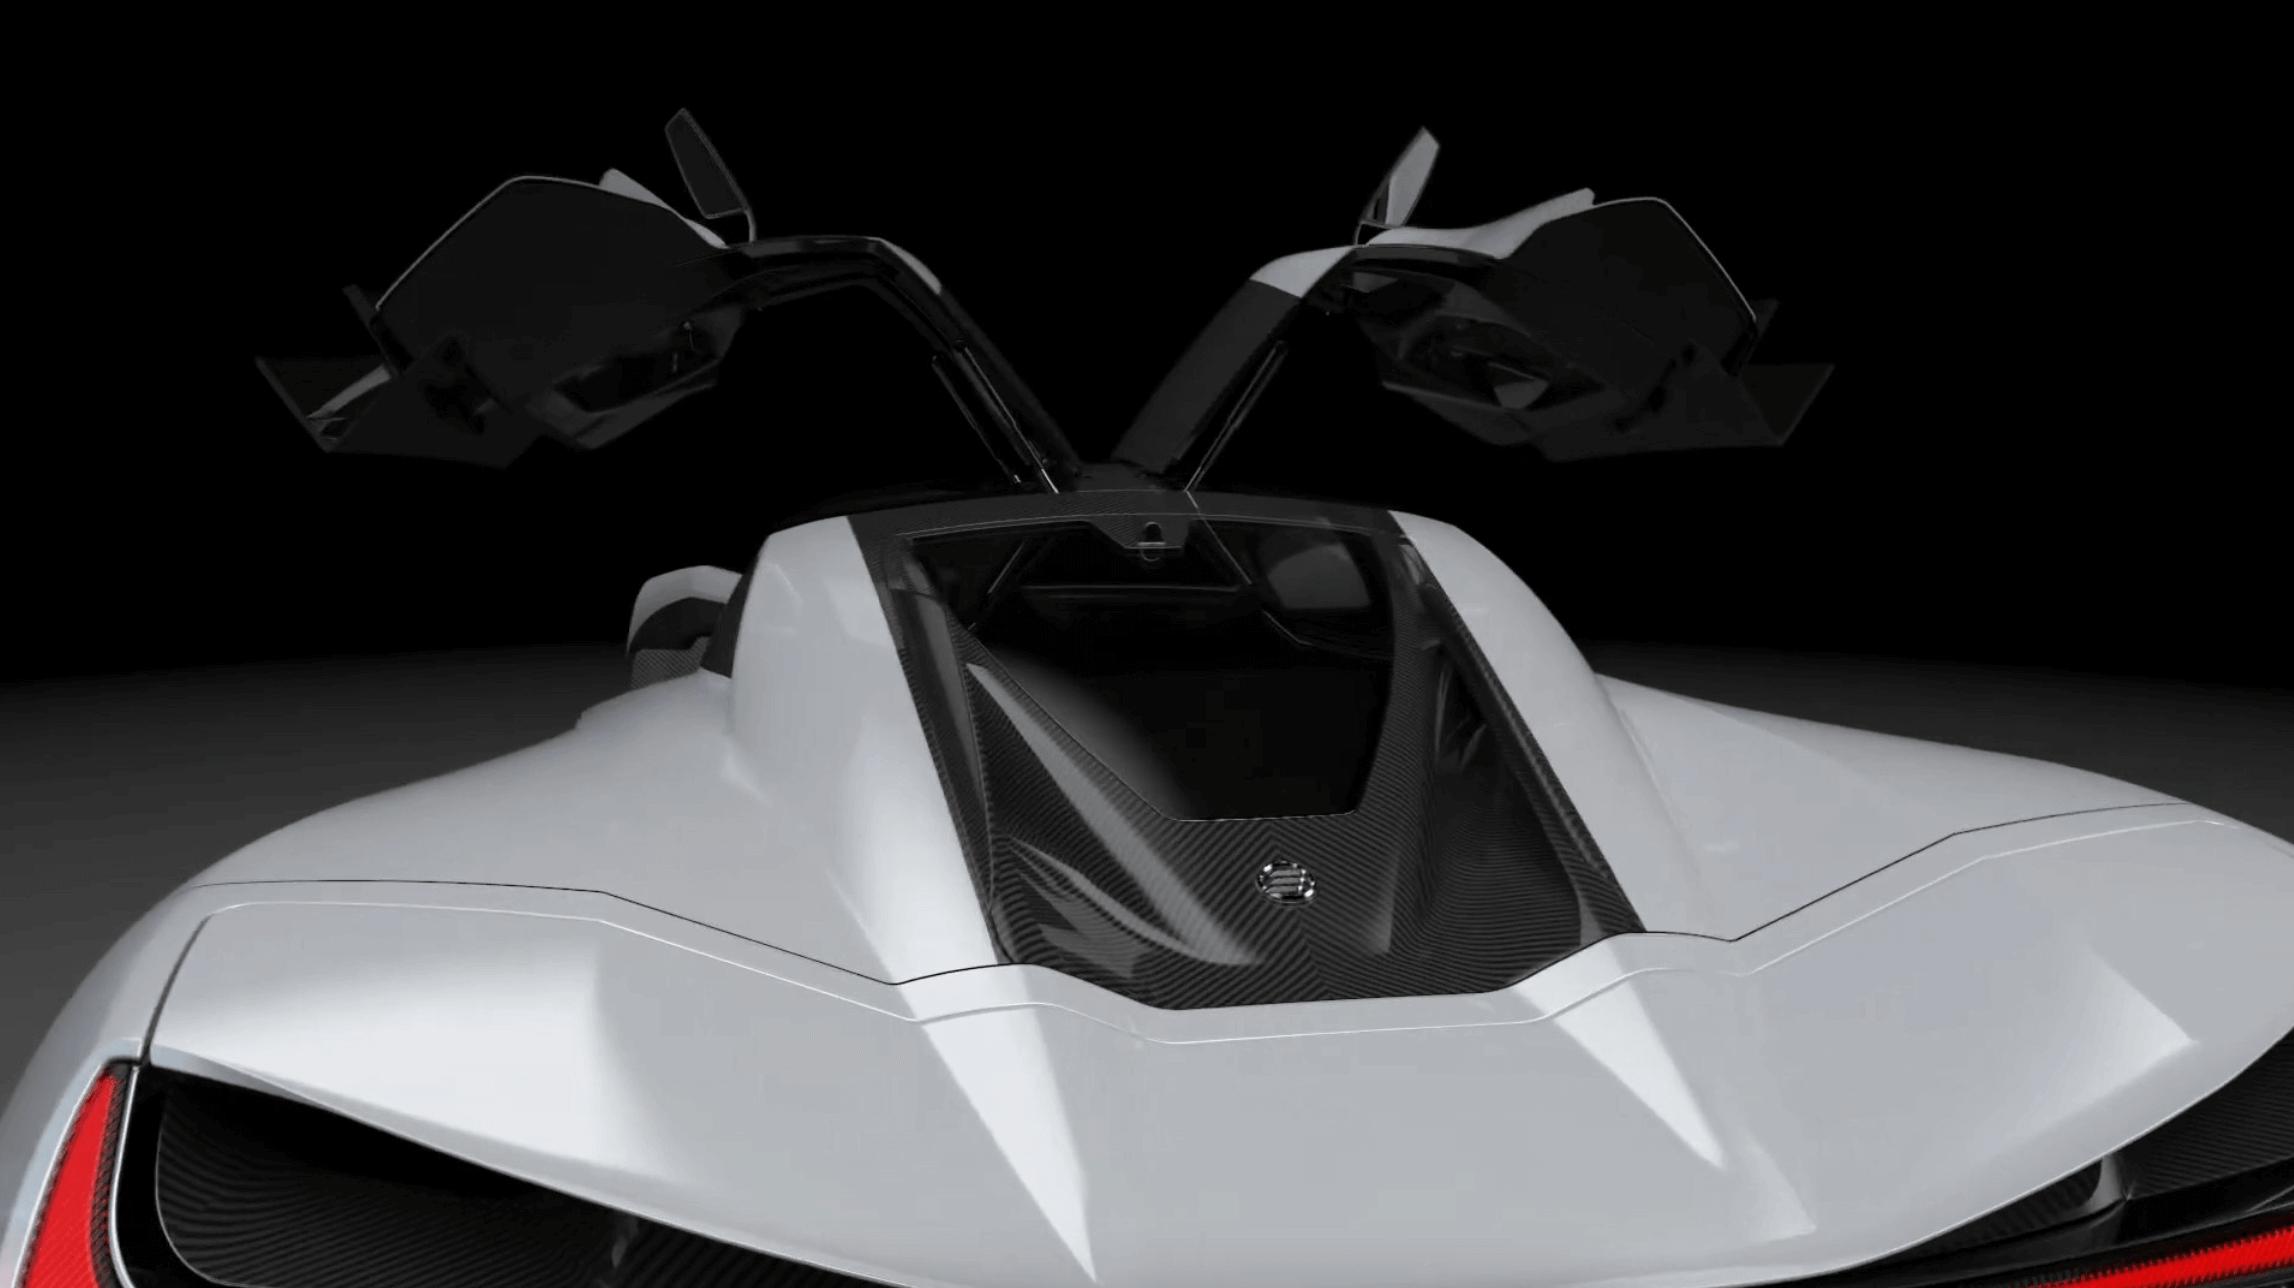 elation hypercars cascadia motian araba tasarım